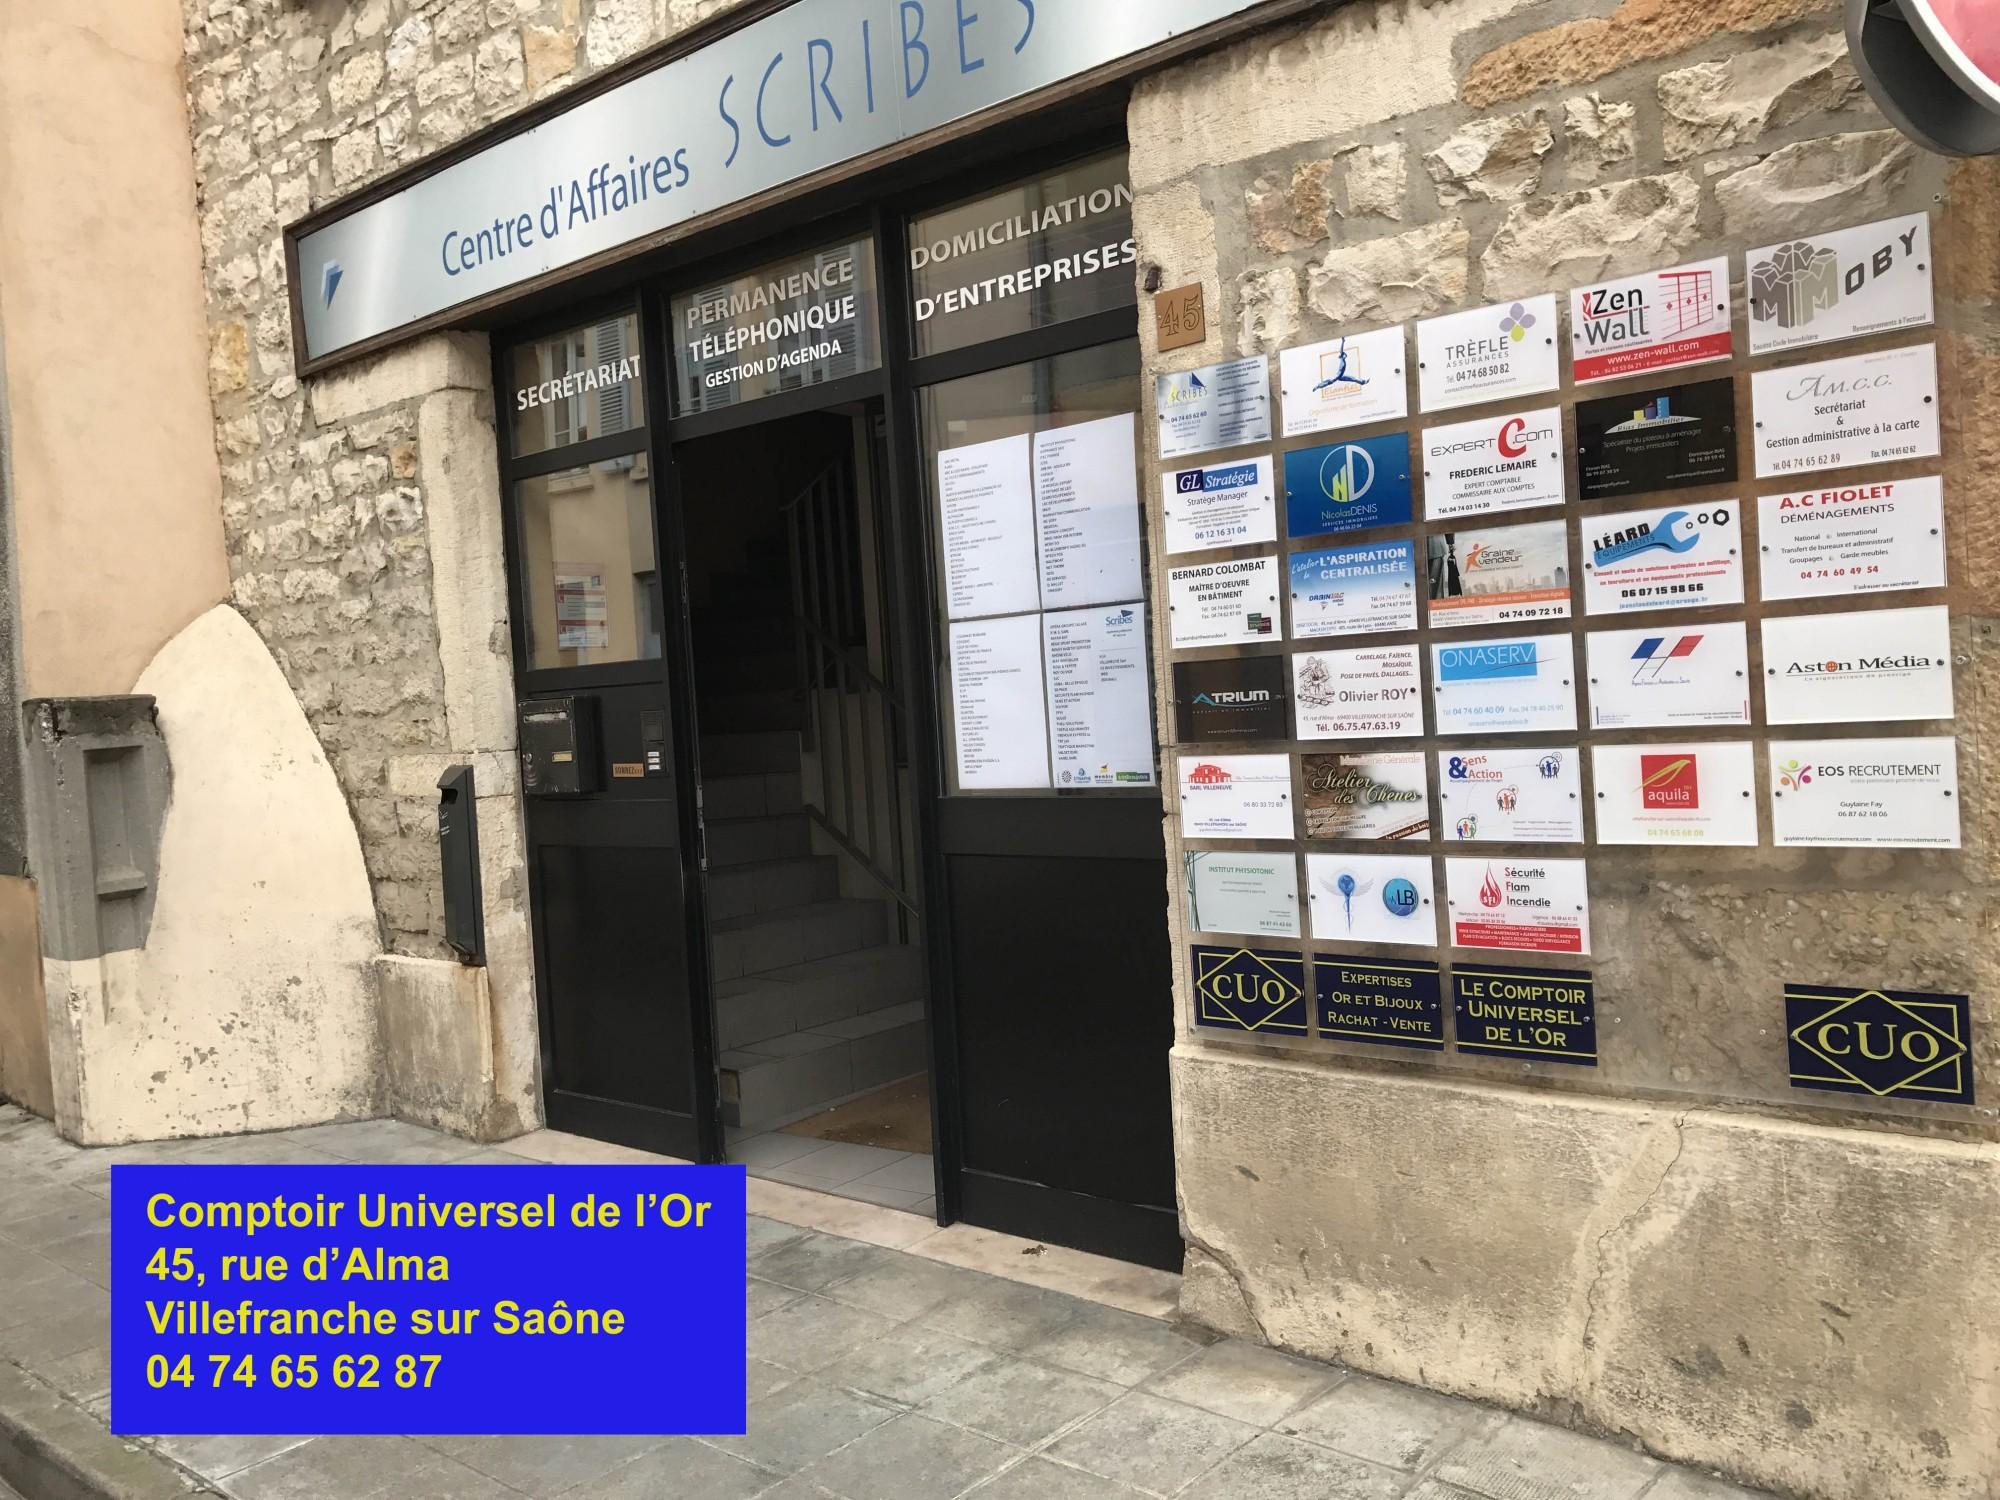 Comptoir Universel de l'or Villefranche